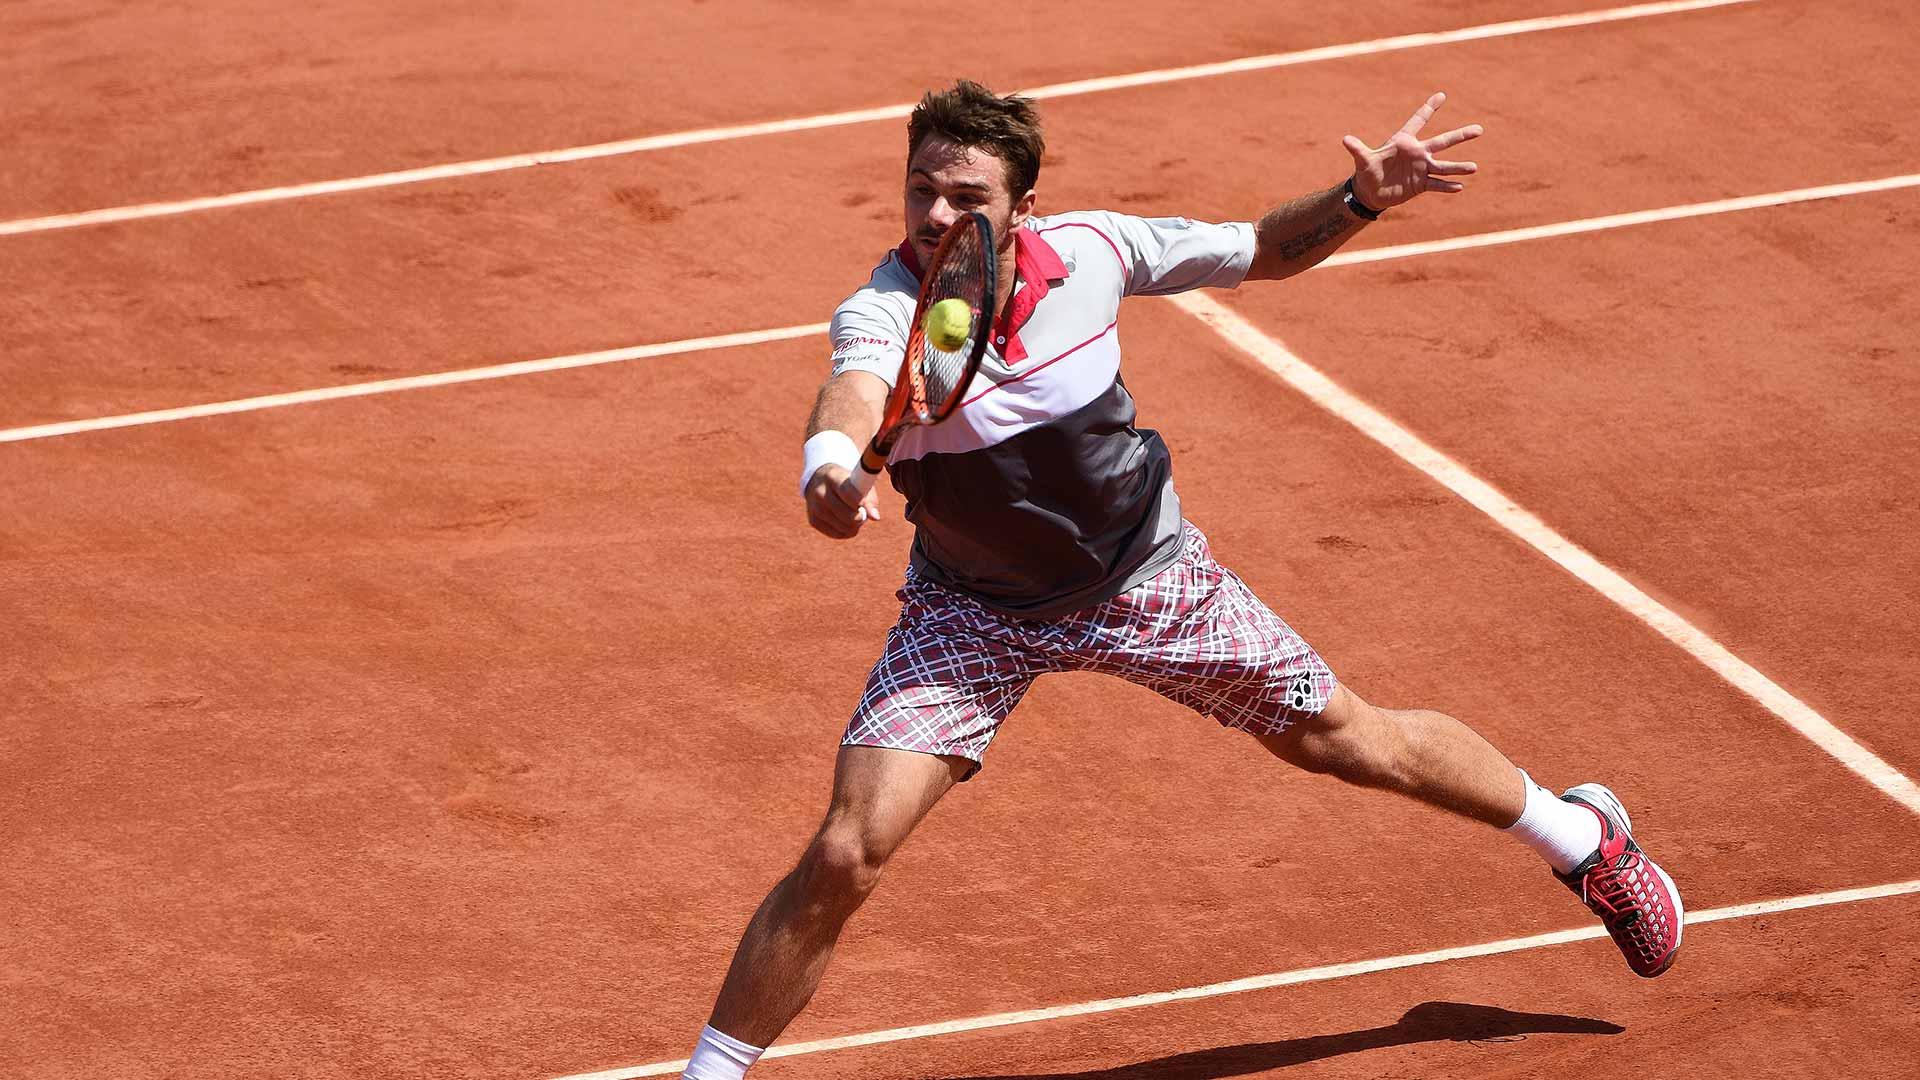 Roland Garros Sunday Wawrinka